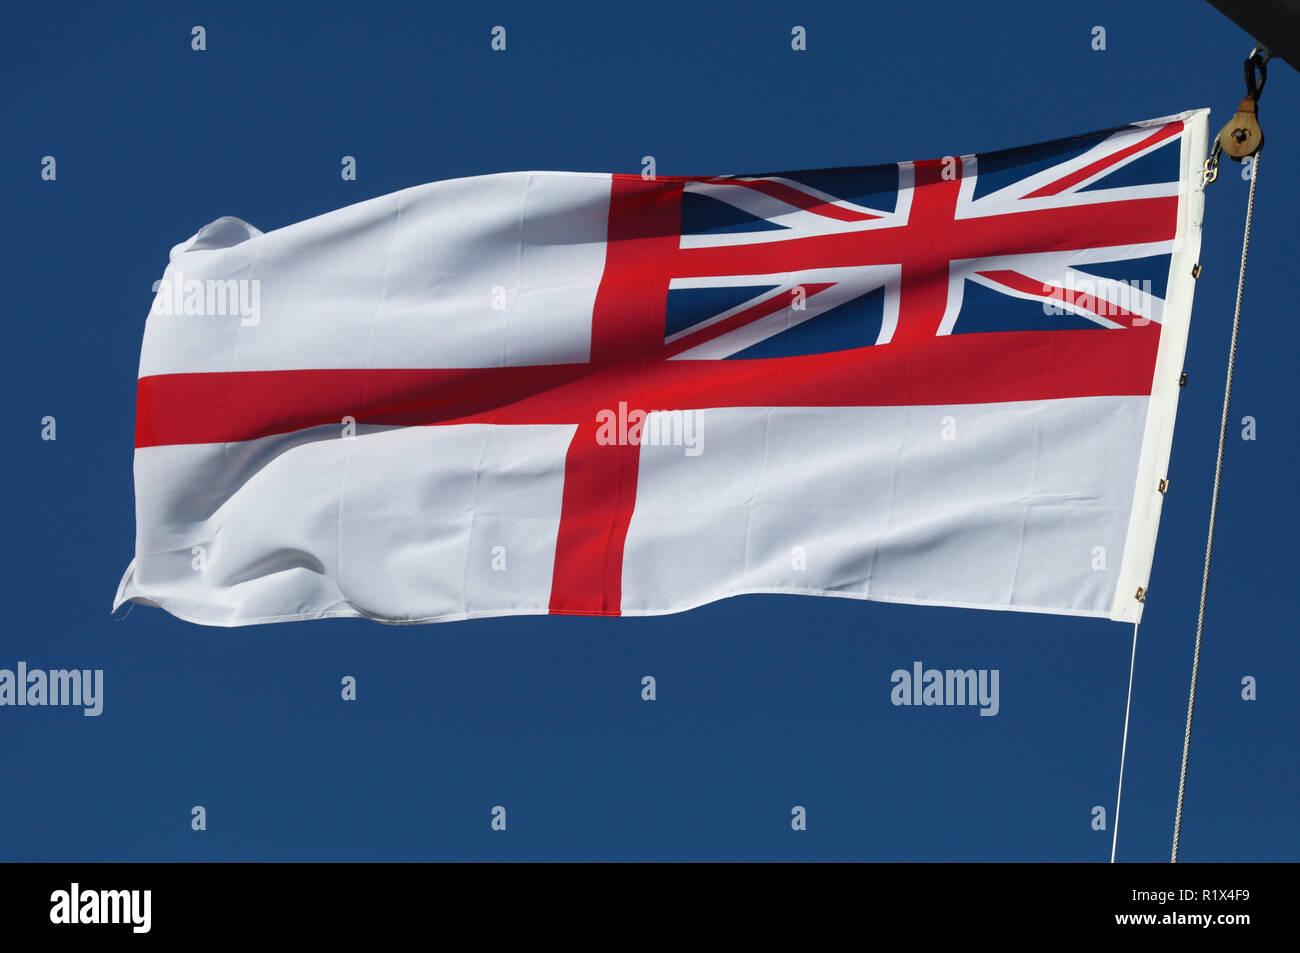 WHITE ENSIGN FLAG 5/' x 3/' British Royal Navy Naval Union Jack St George Cross